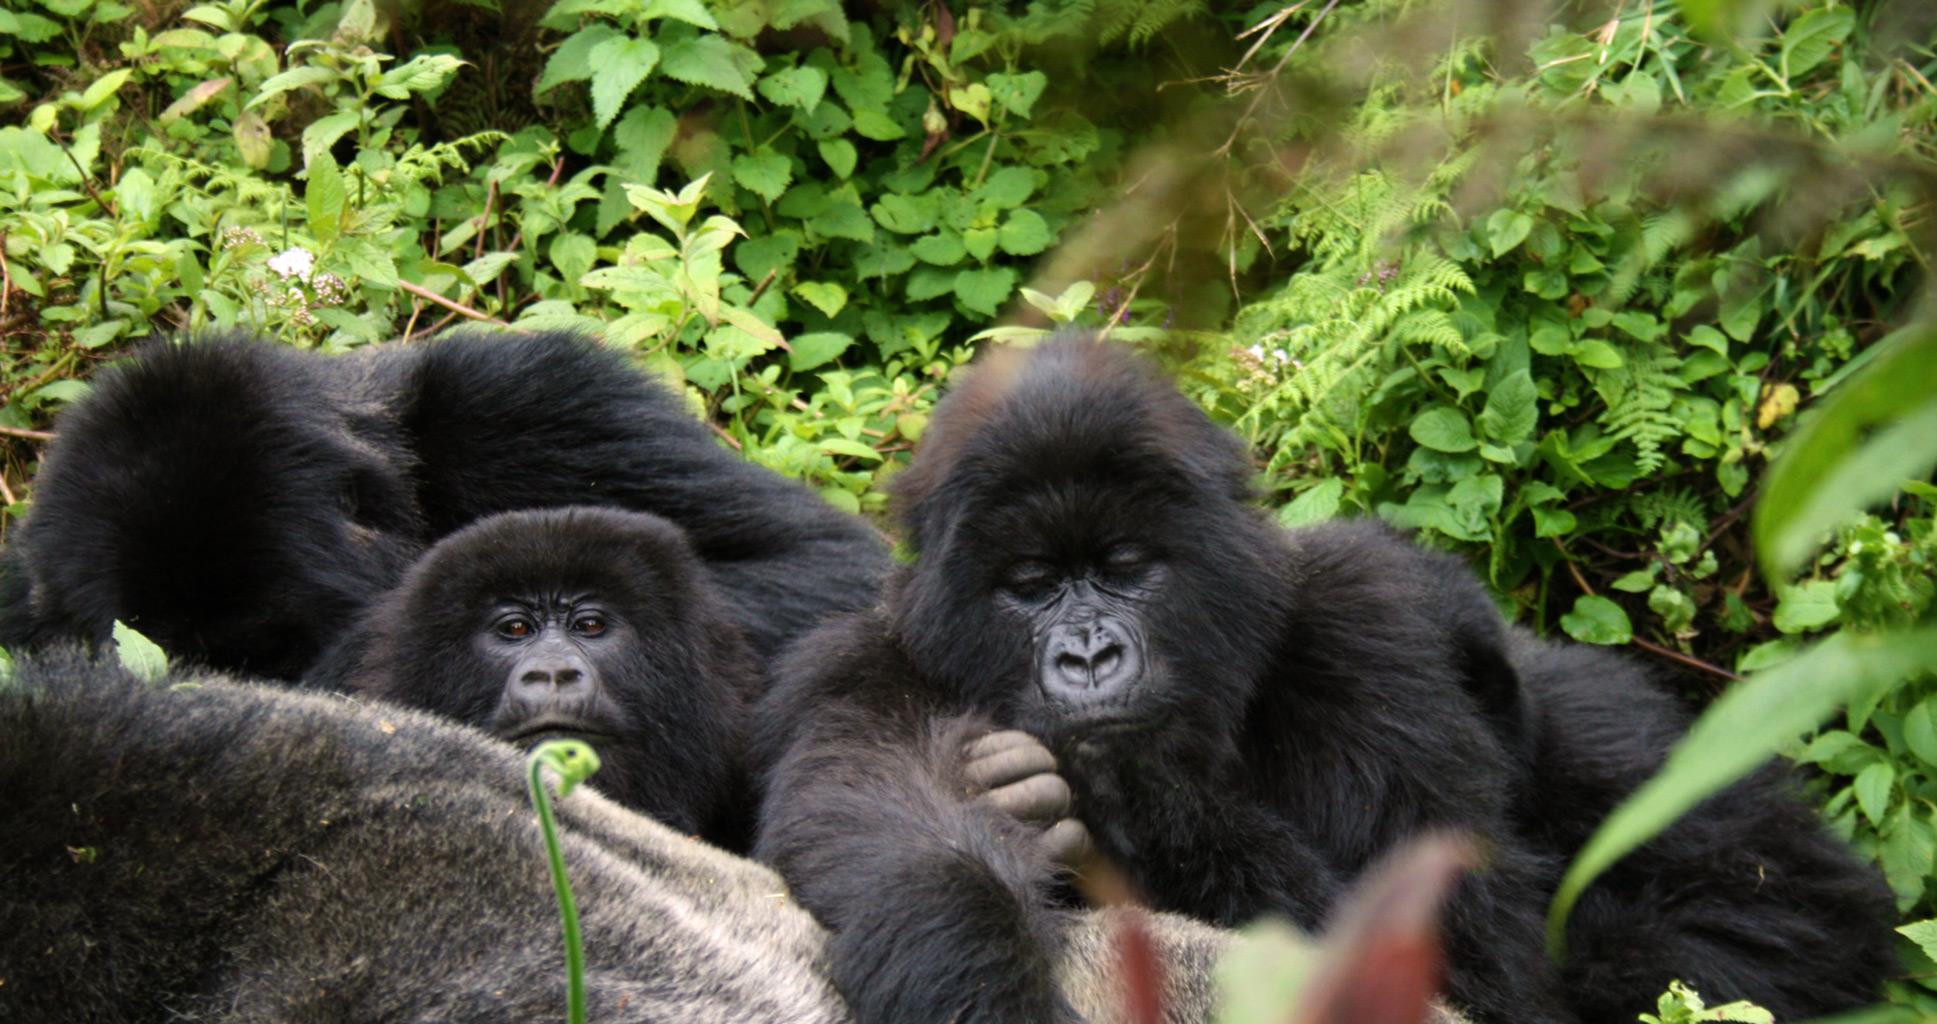 ulyces-gorillawars-couv